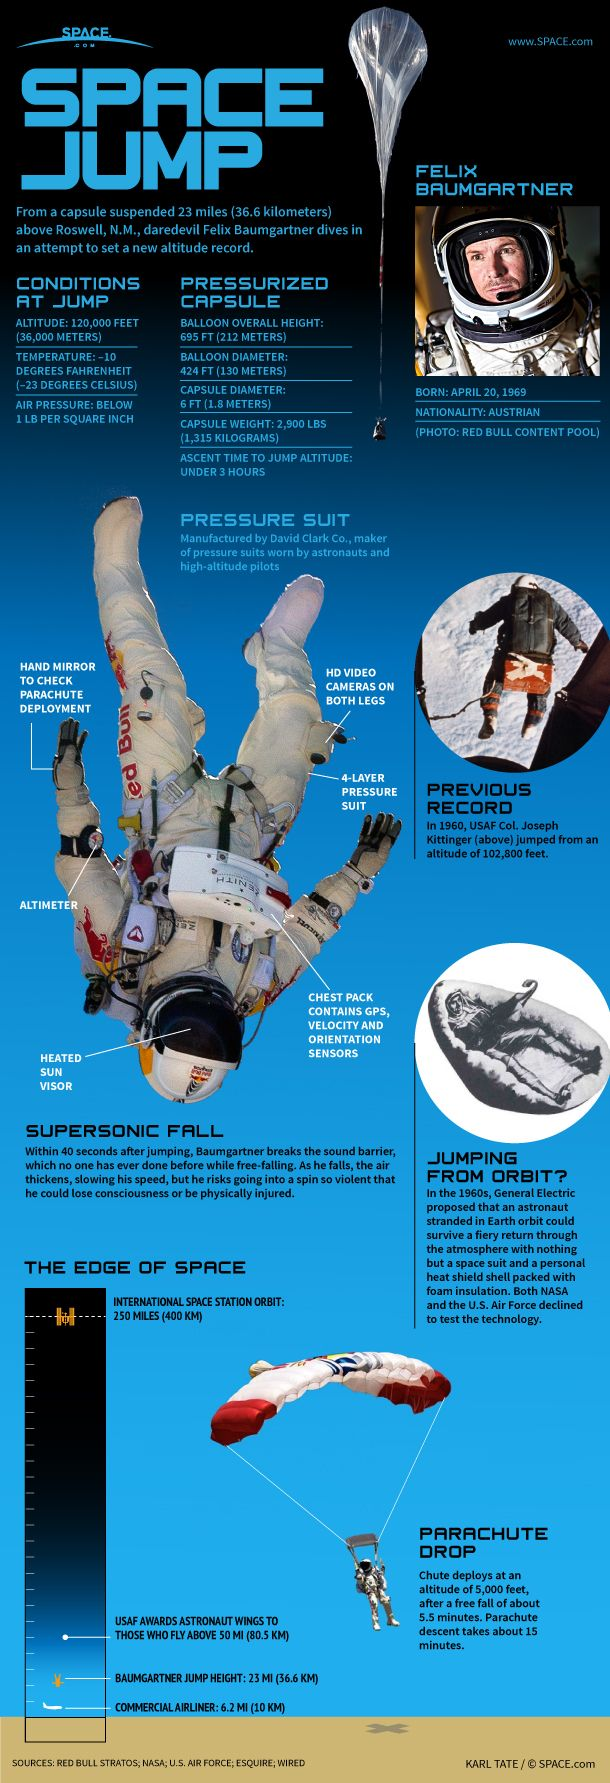 Space Jump: How Felix Baumgartner's Record-Breaking Supersonic Skydive Works…